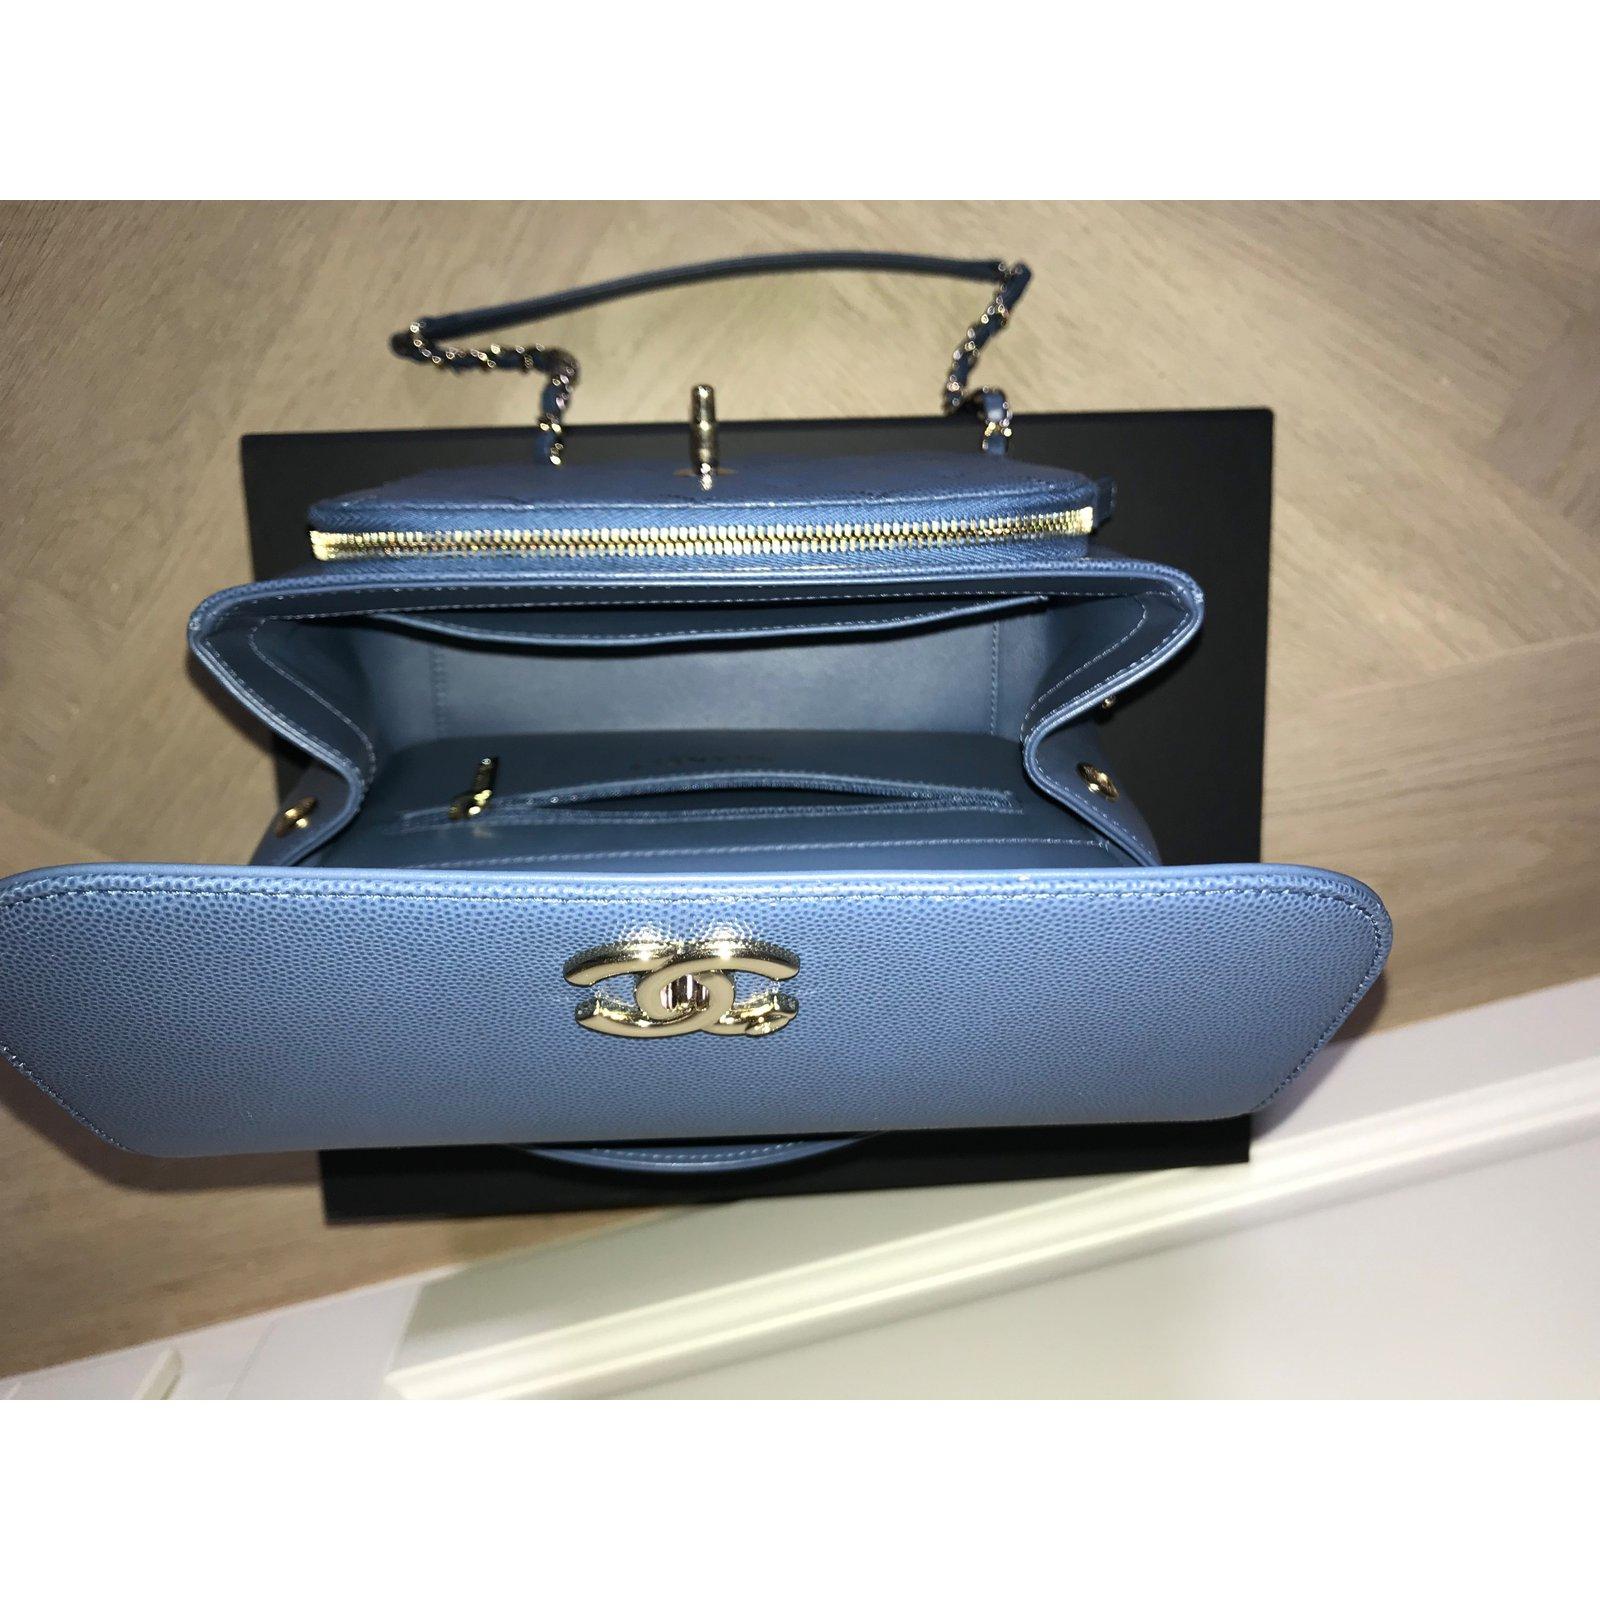 37a24f4996ea Chanel Affinity Handbags Leather Blue ref.72712 - Joli Closet